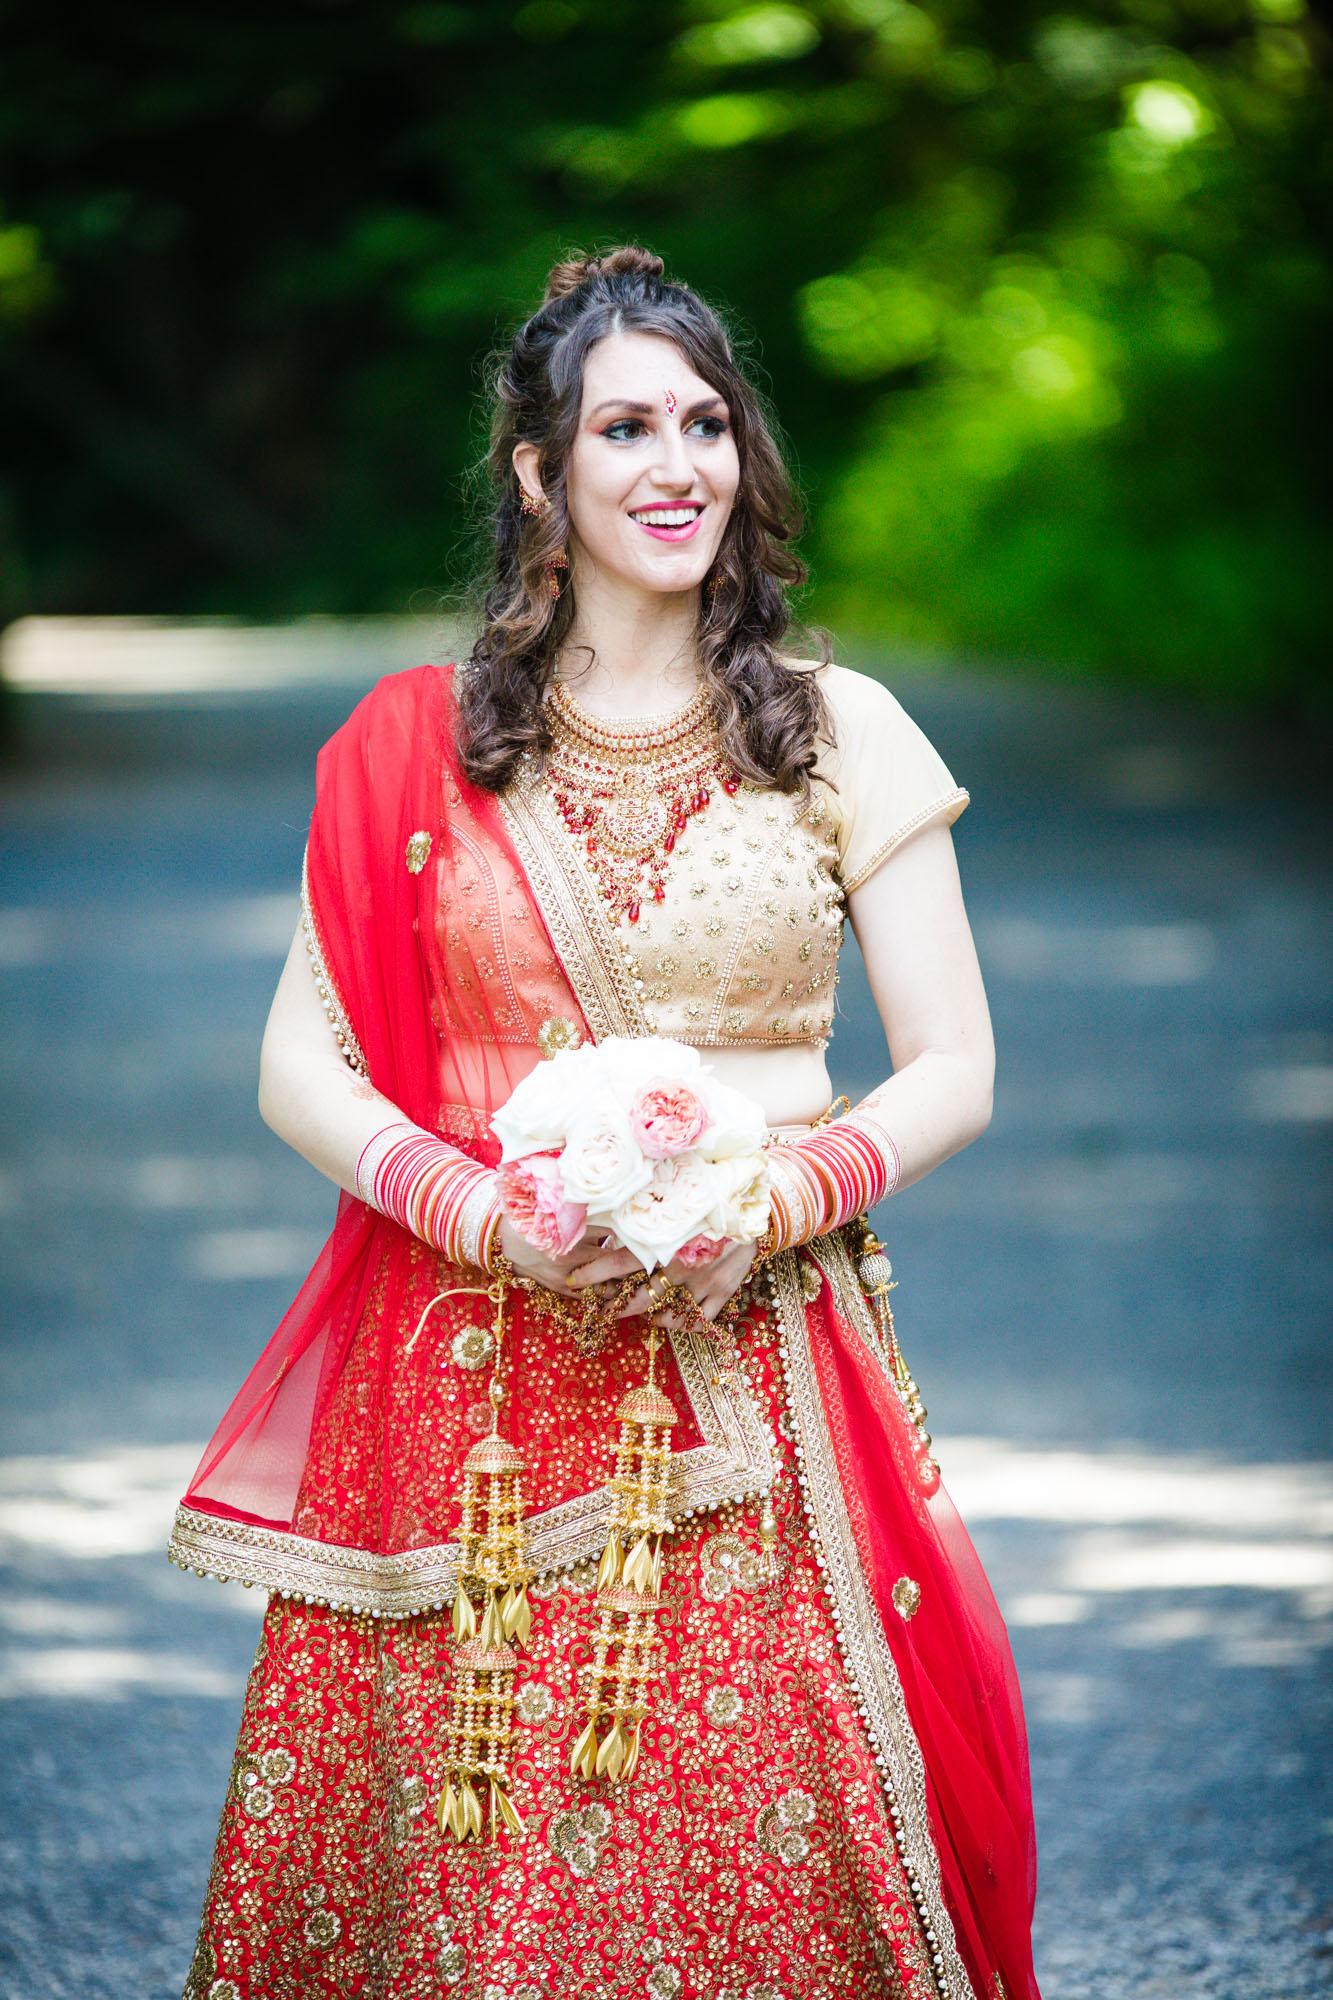 VALLEY GREEN INN WEDDING PHOTOS - 004.jpg